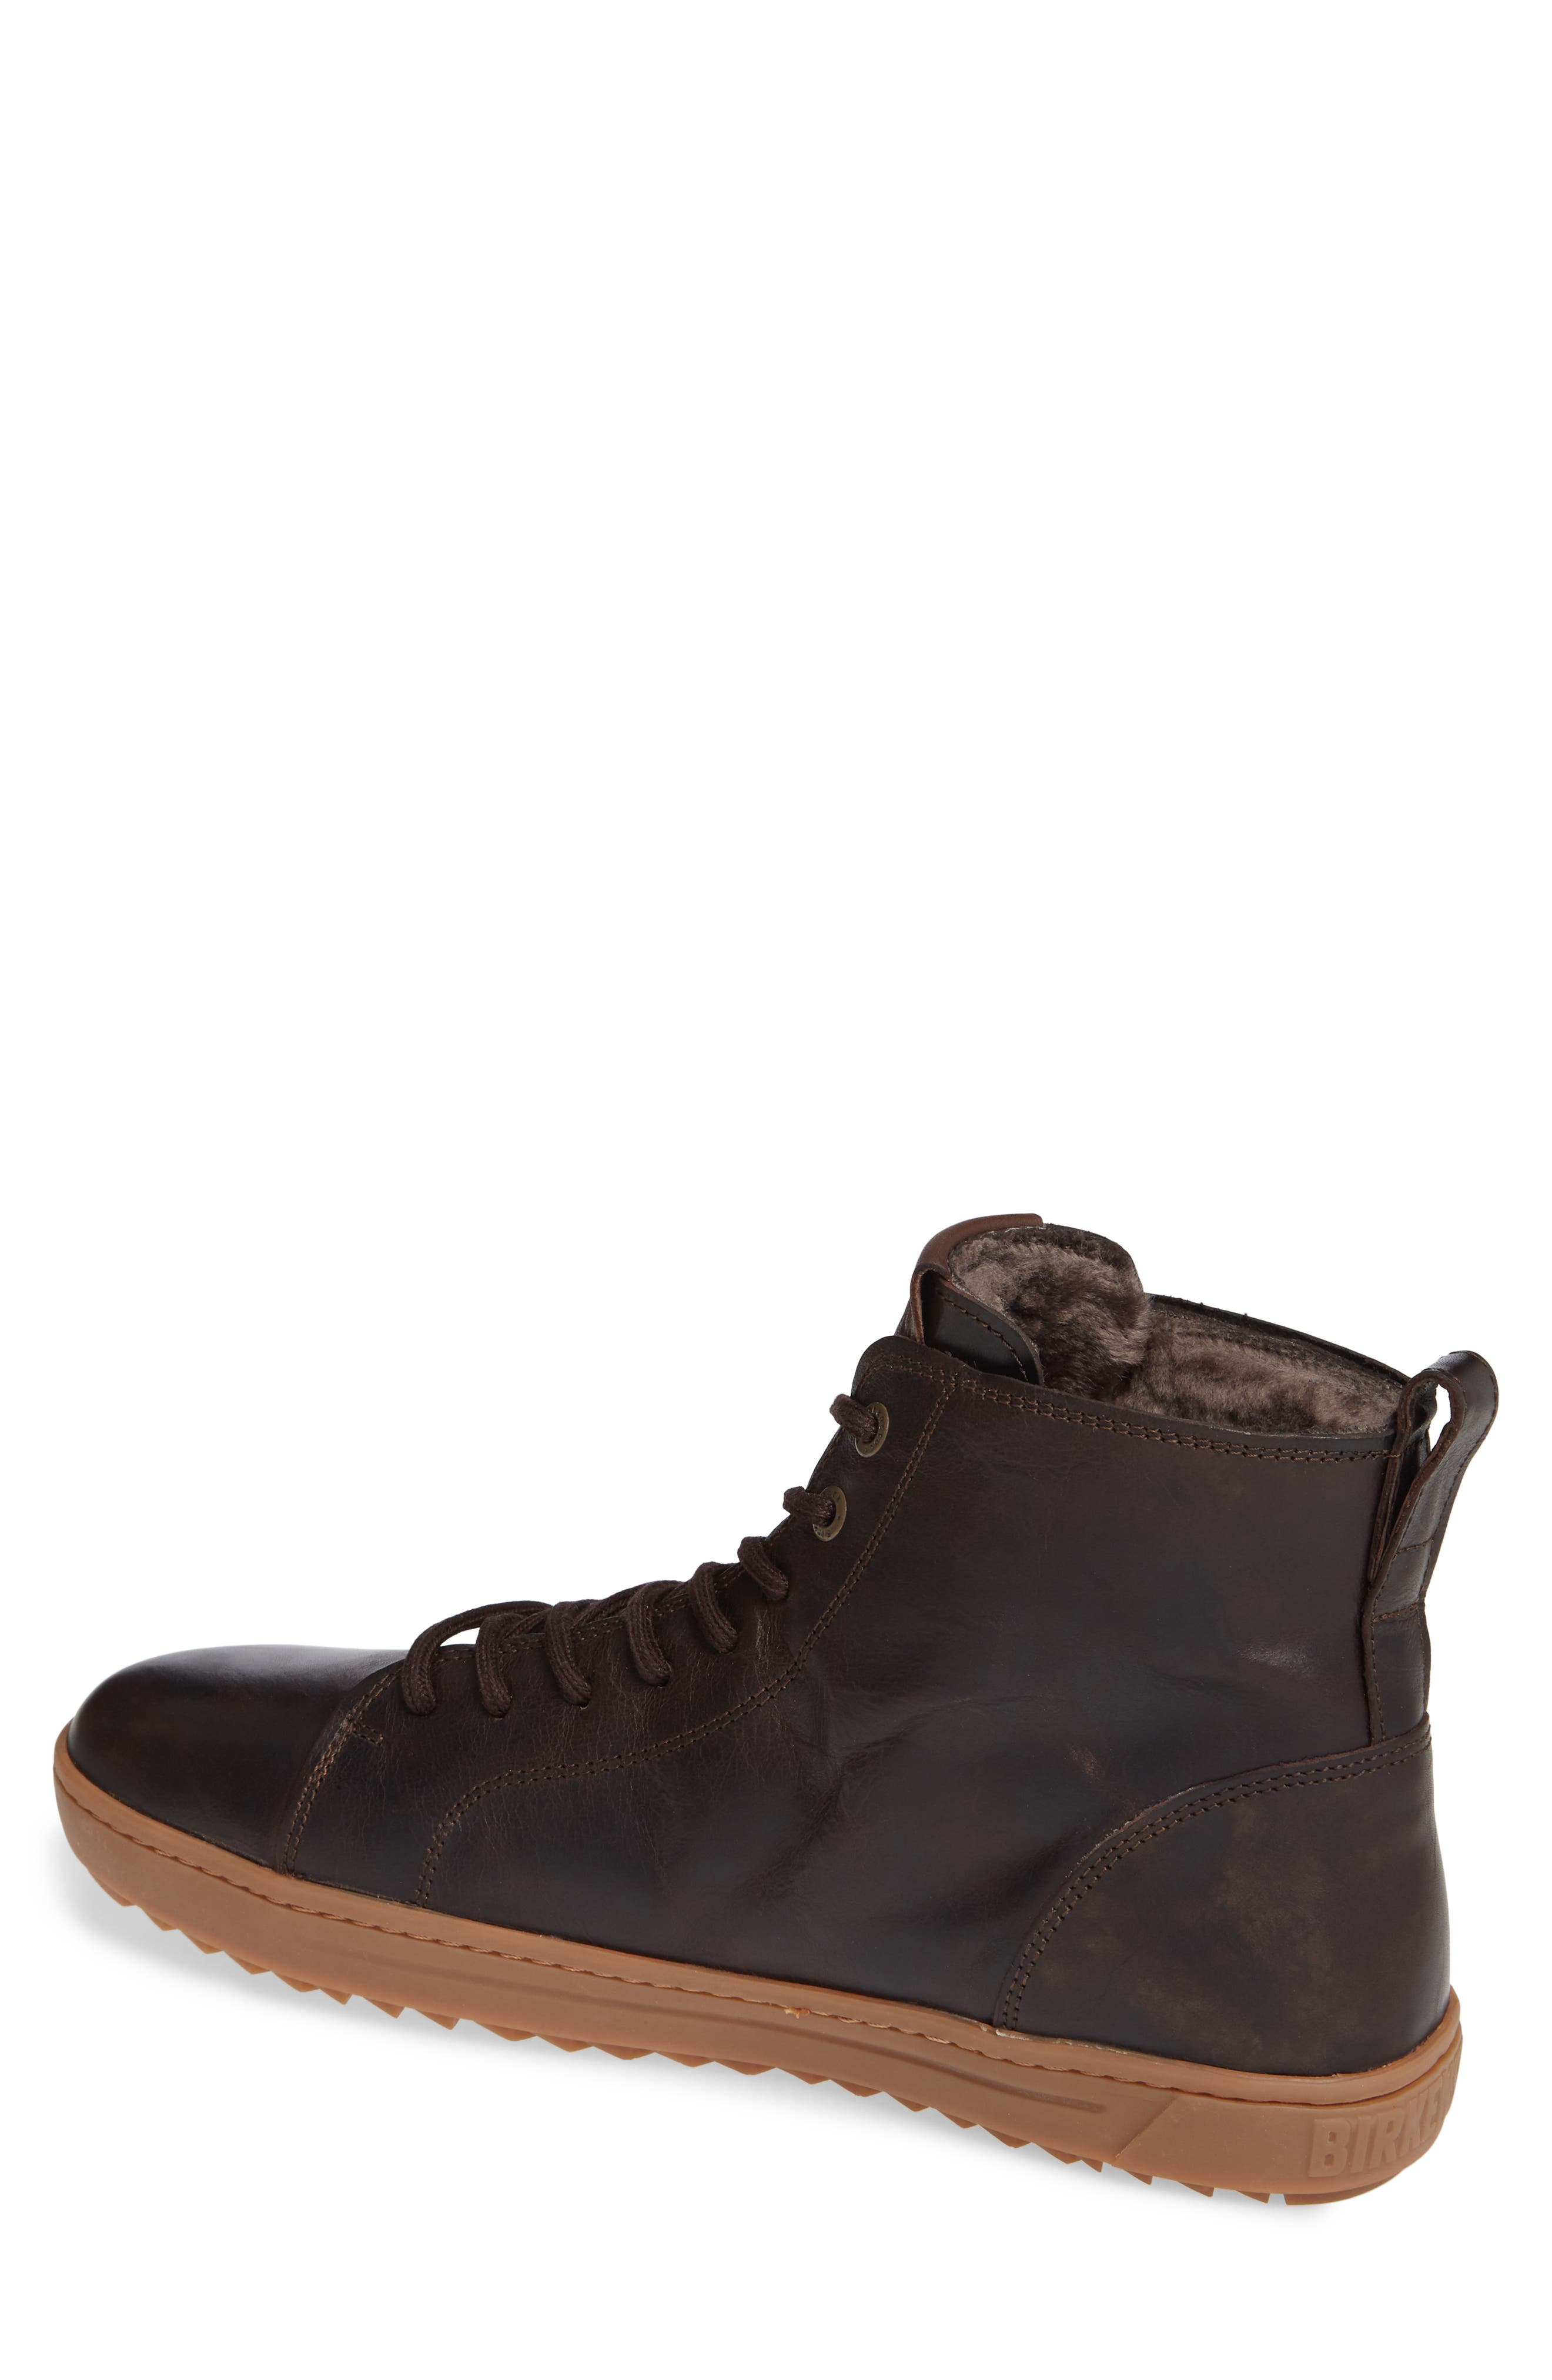 Barlett Genuine Shearling Sneaker,                             Alternate thumbnail 2, color,                             BROWN